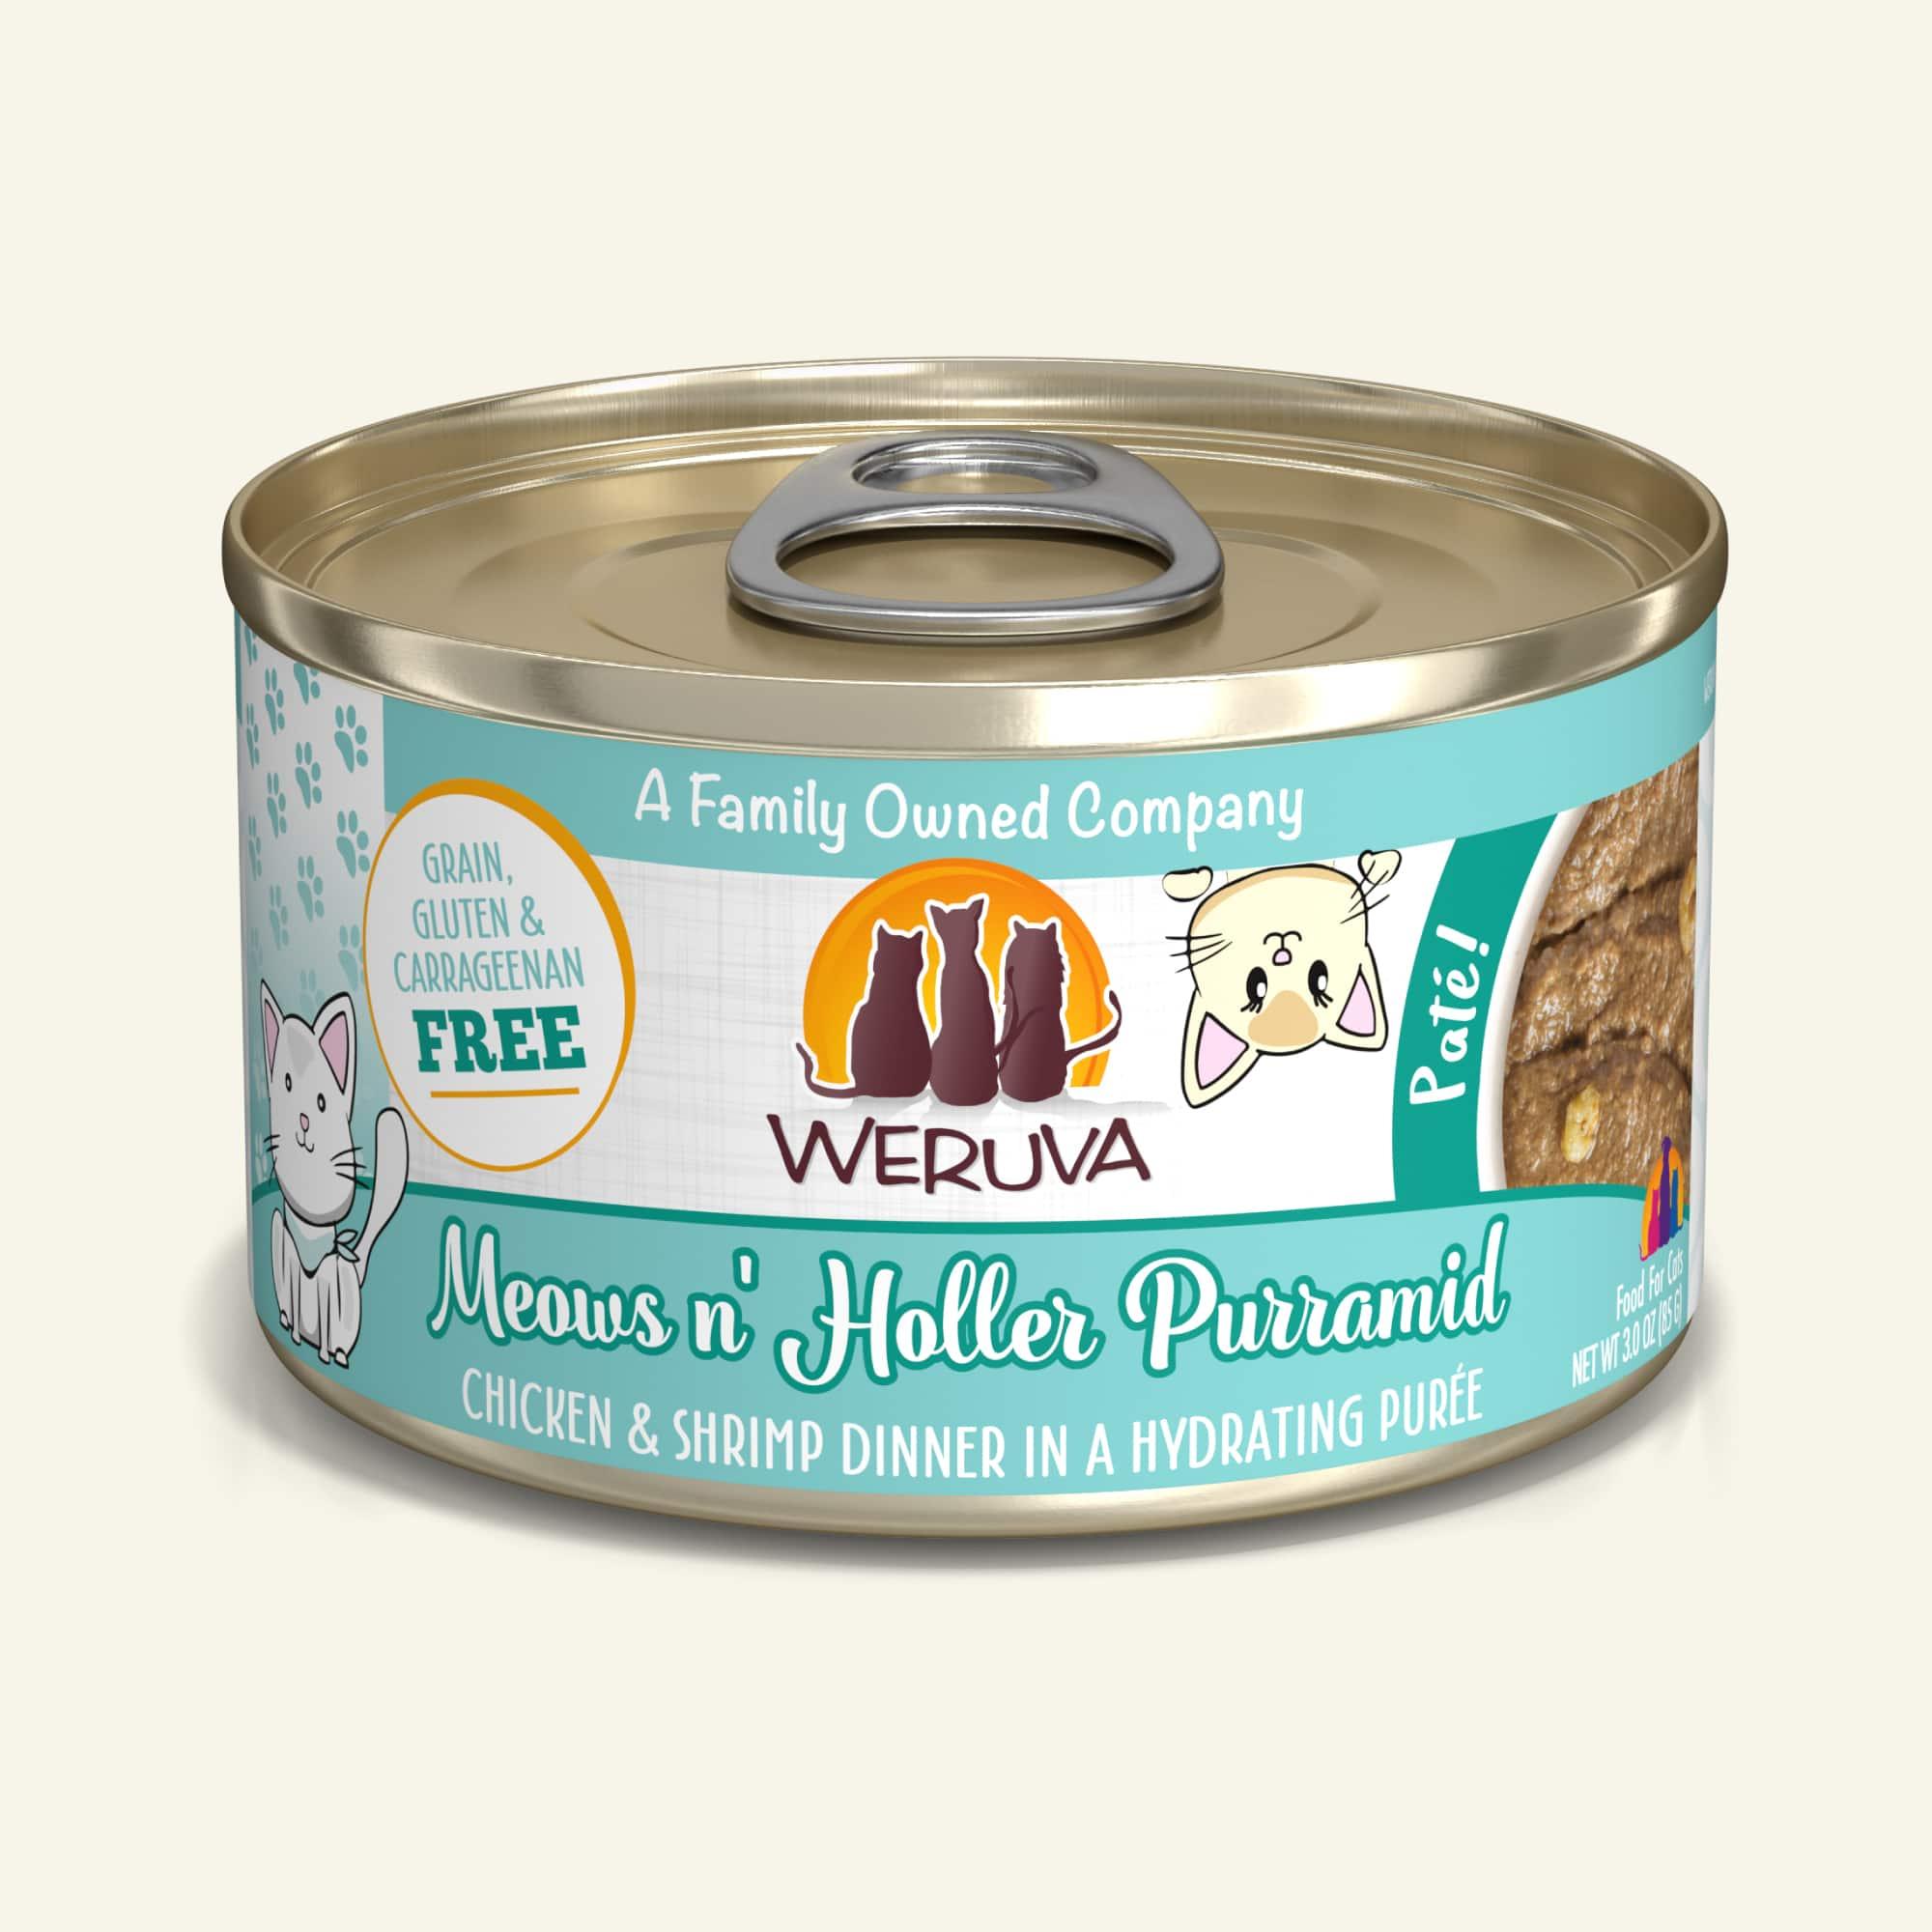 Weruva Cat Pate Meows n' Holler PurrAmid Chicken & Shrimp Dinner in Puree Wet Cat Food Image